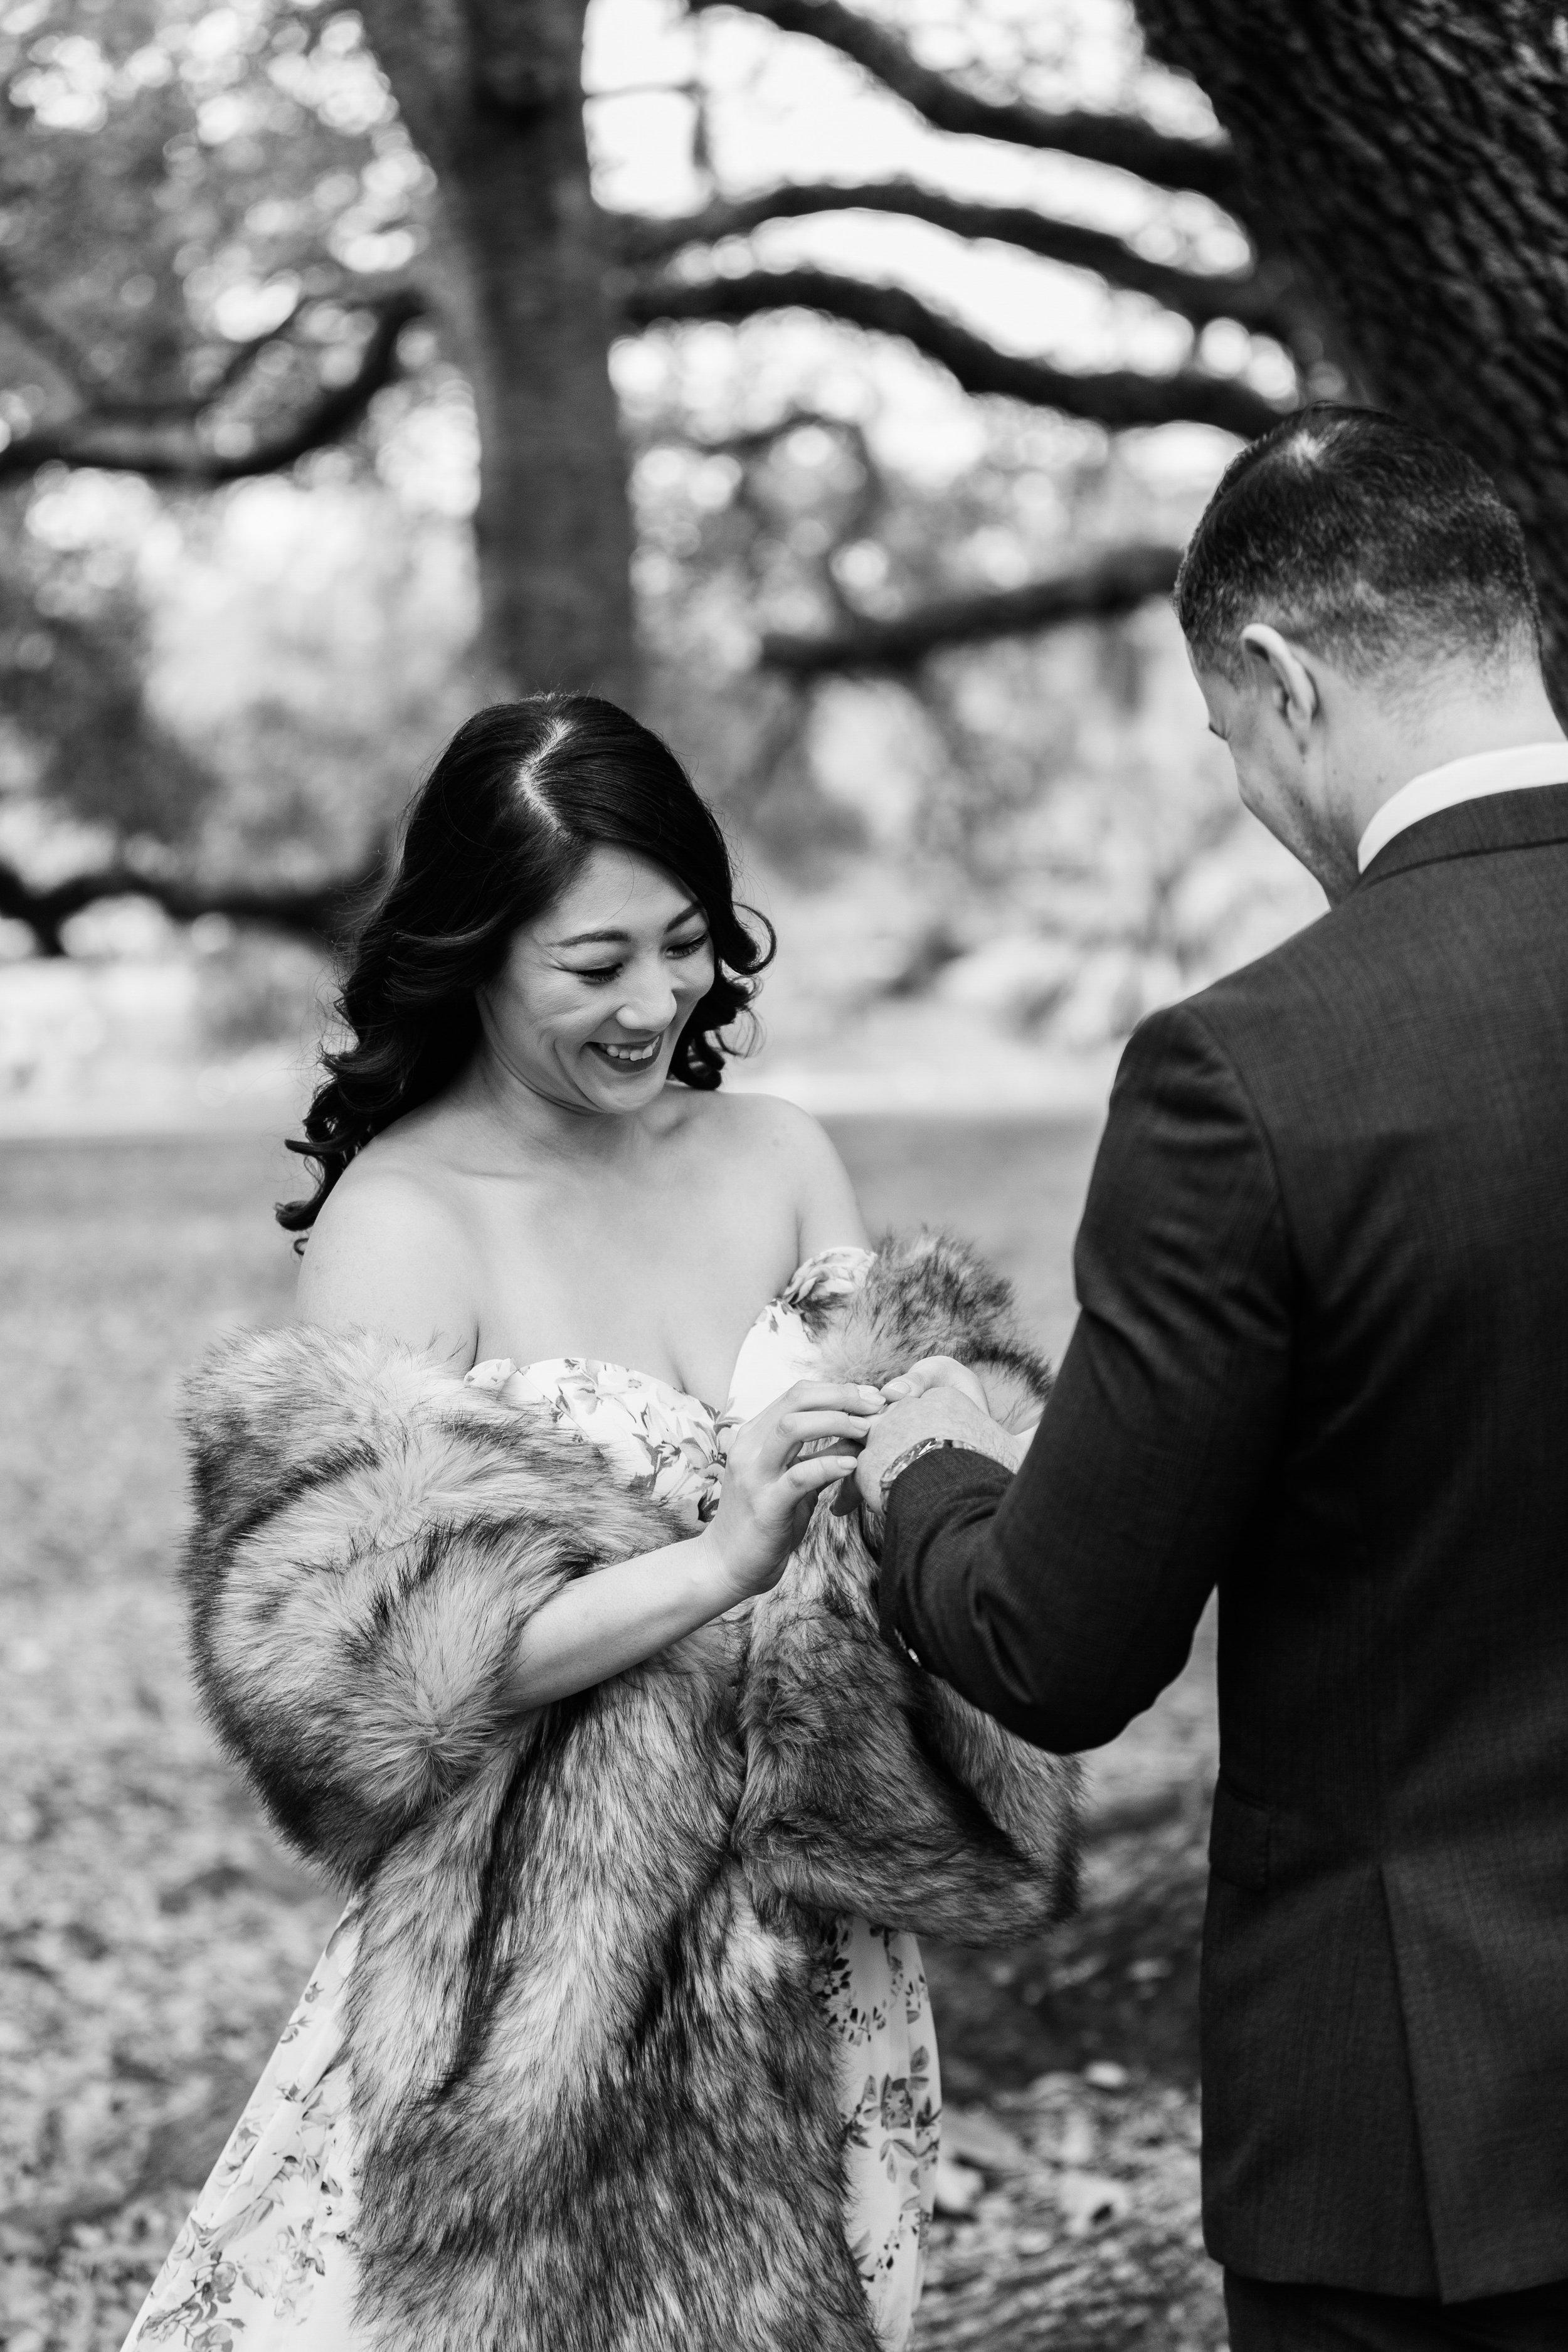 City Park Elopement New Orleans Wedding Photographer Ashley Biltz Photography10.jpg